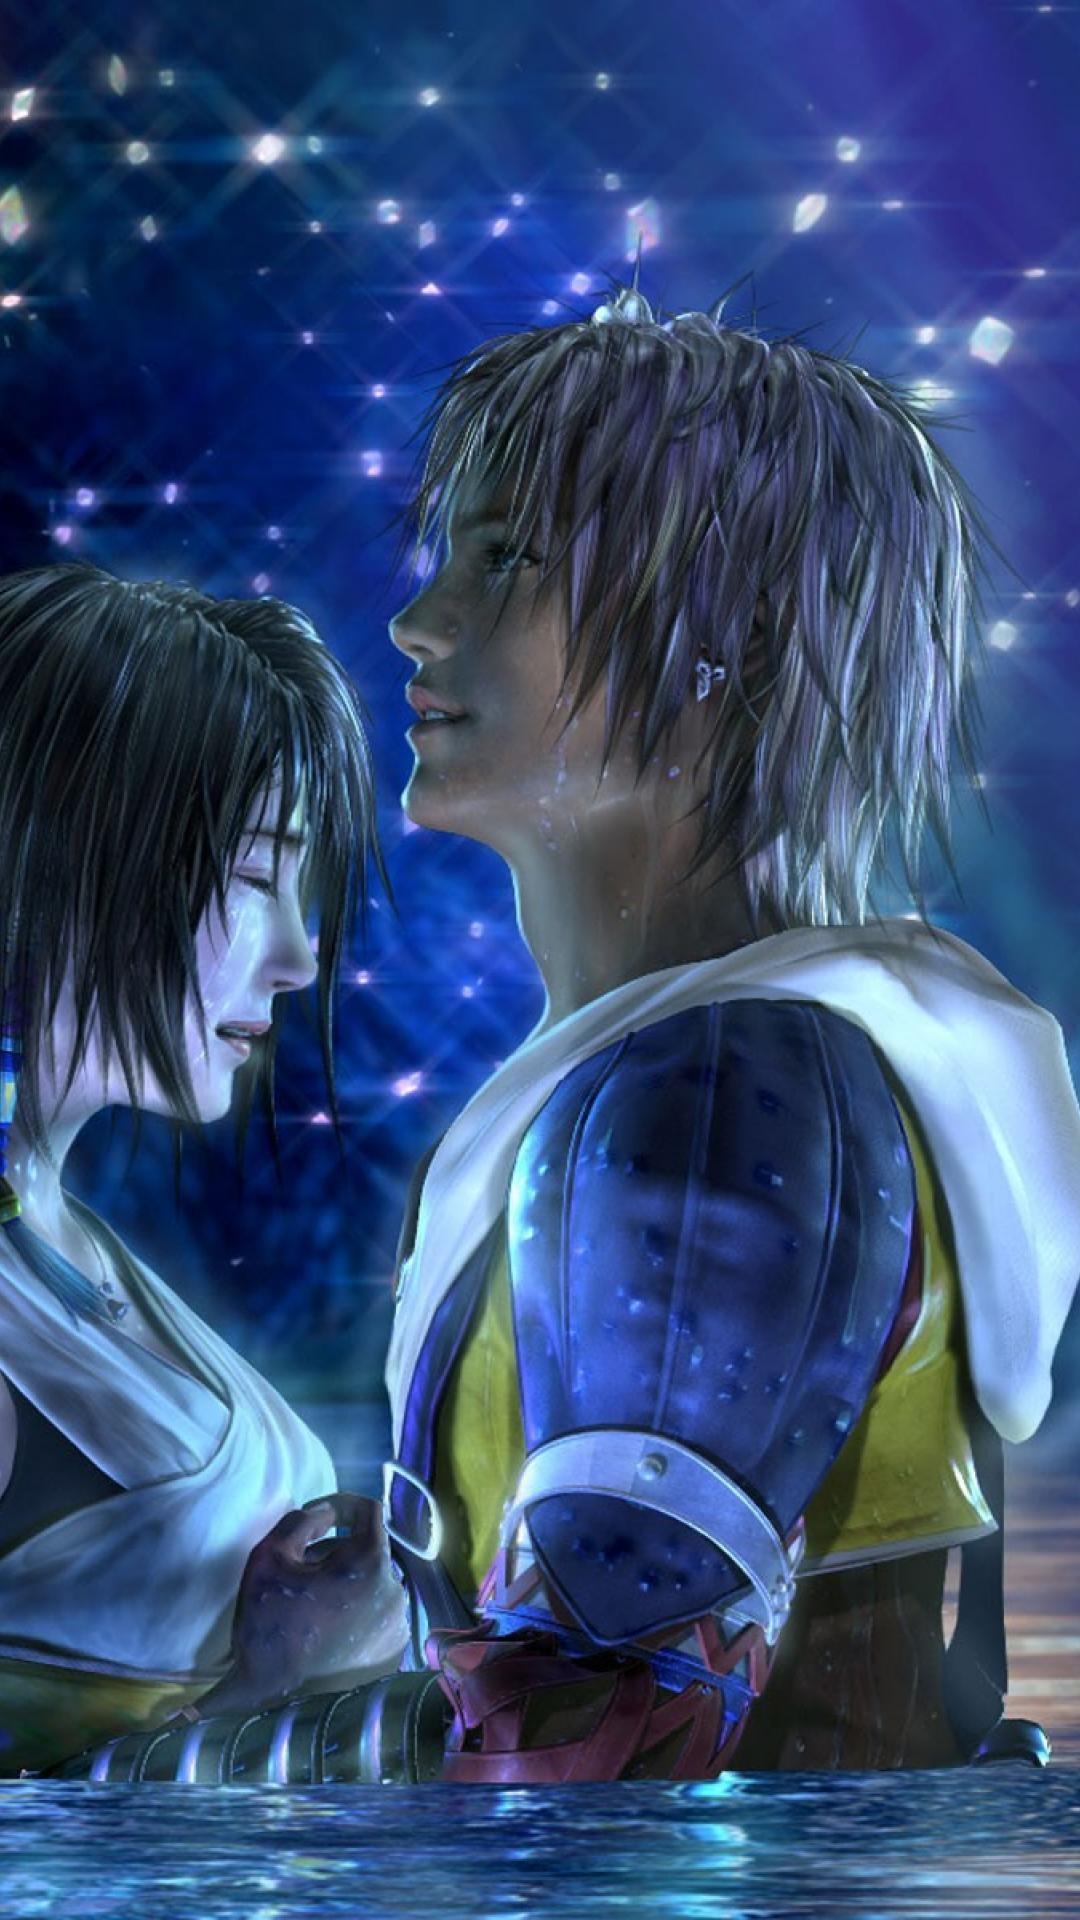 Final Fantasy X Wallpaper (71+ images)